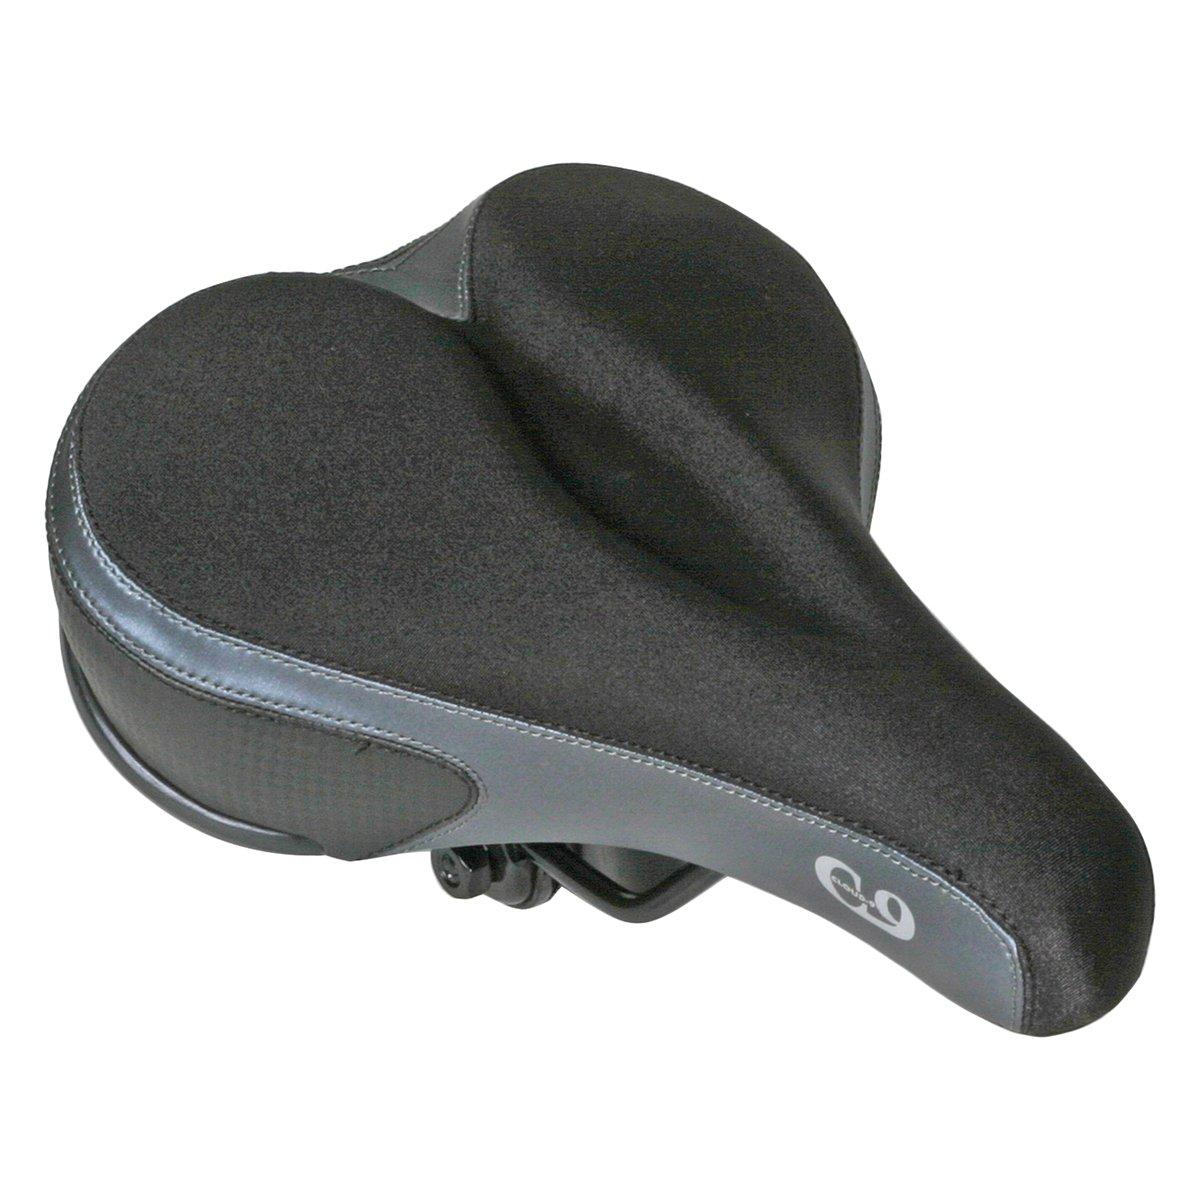 Cloud-9 Comfort Gel Mens Bicycle Suspension Comfort Saddles Tri Color Lycra Sunlite